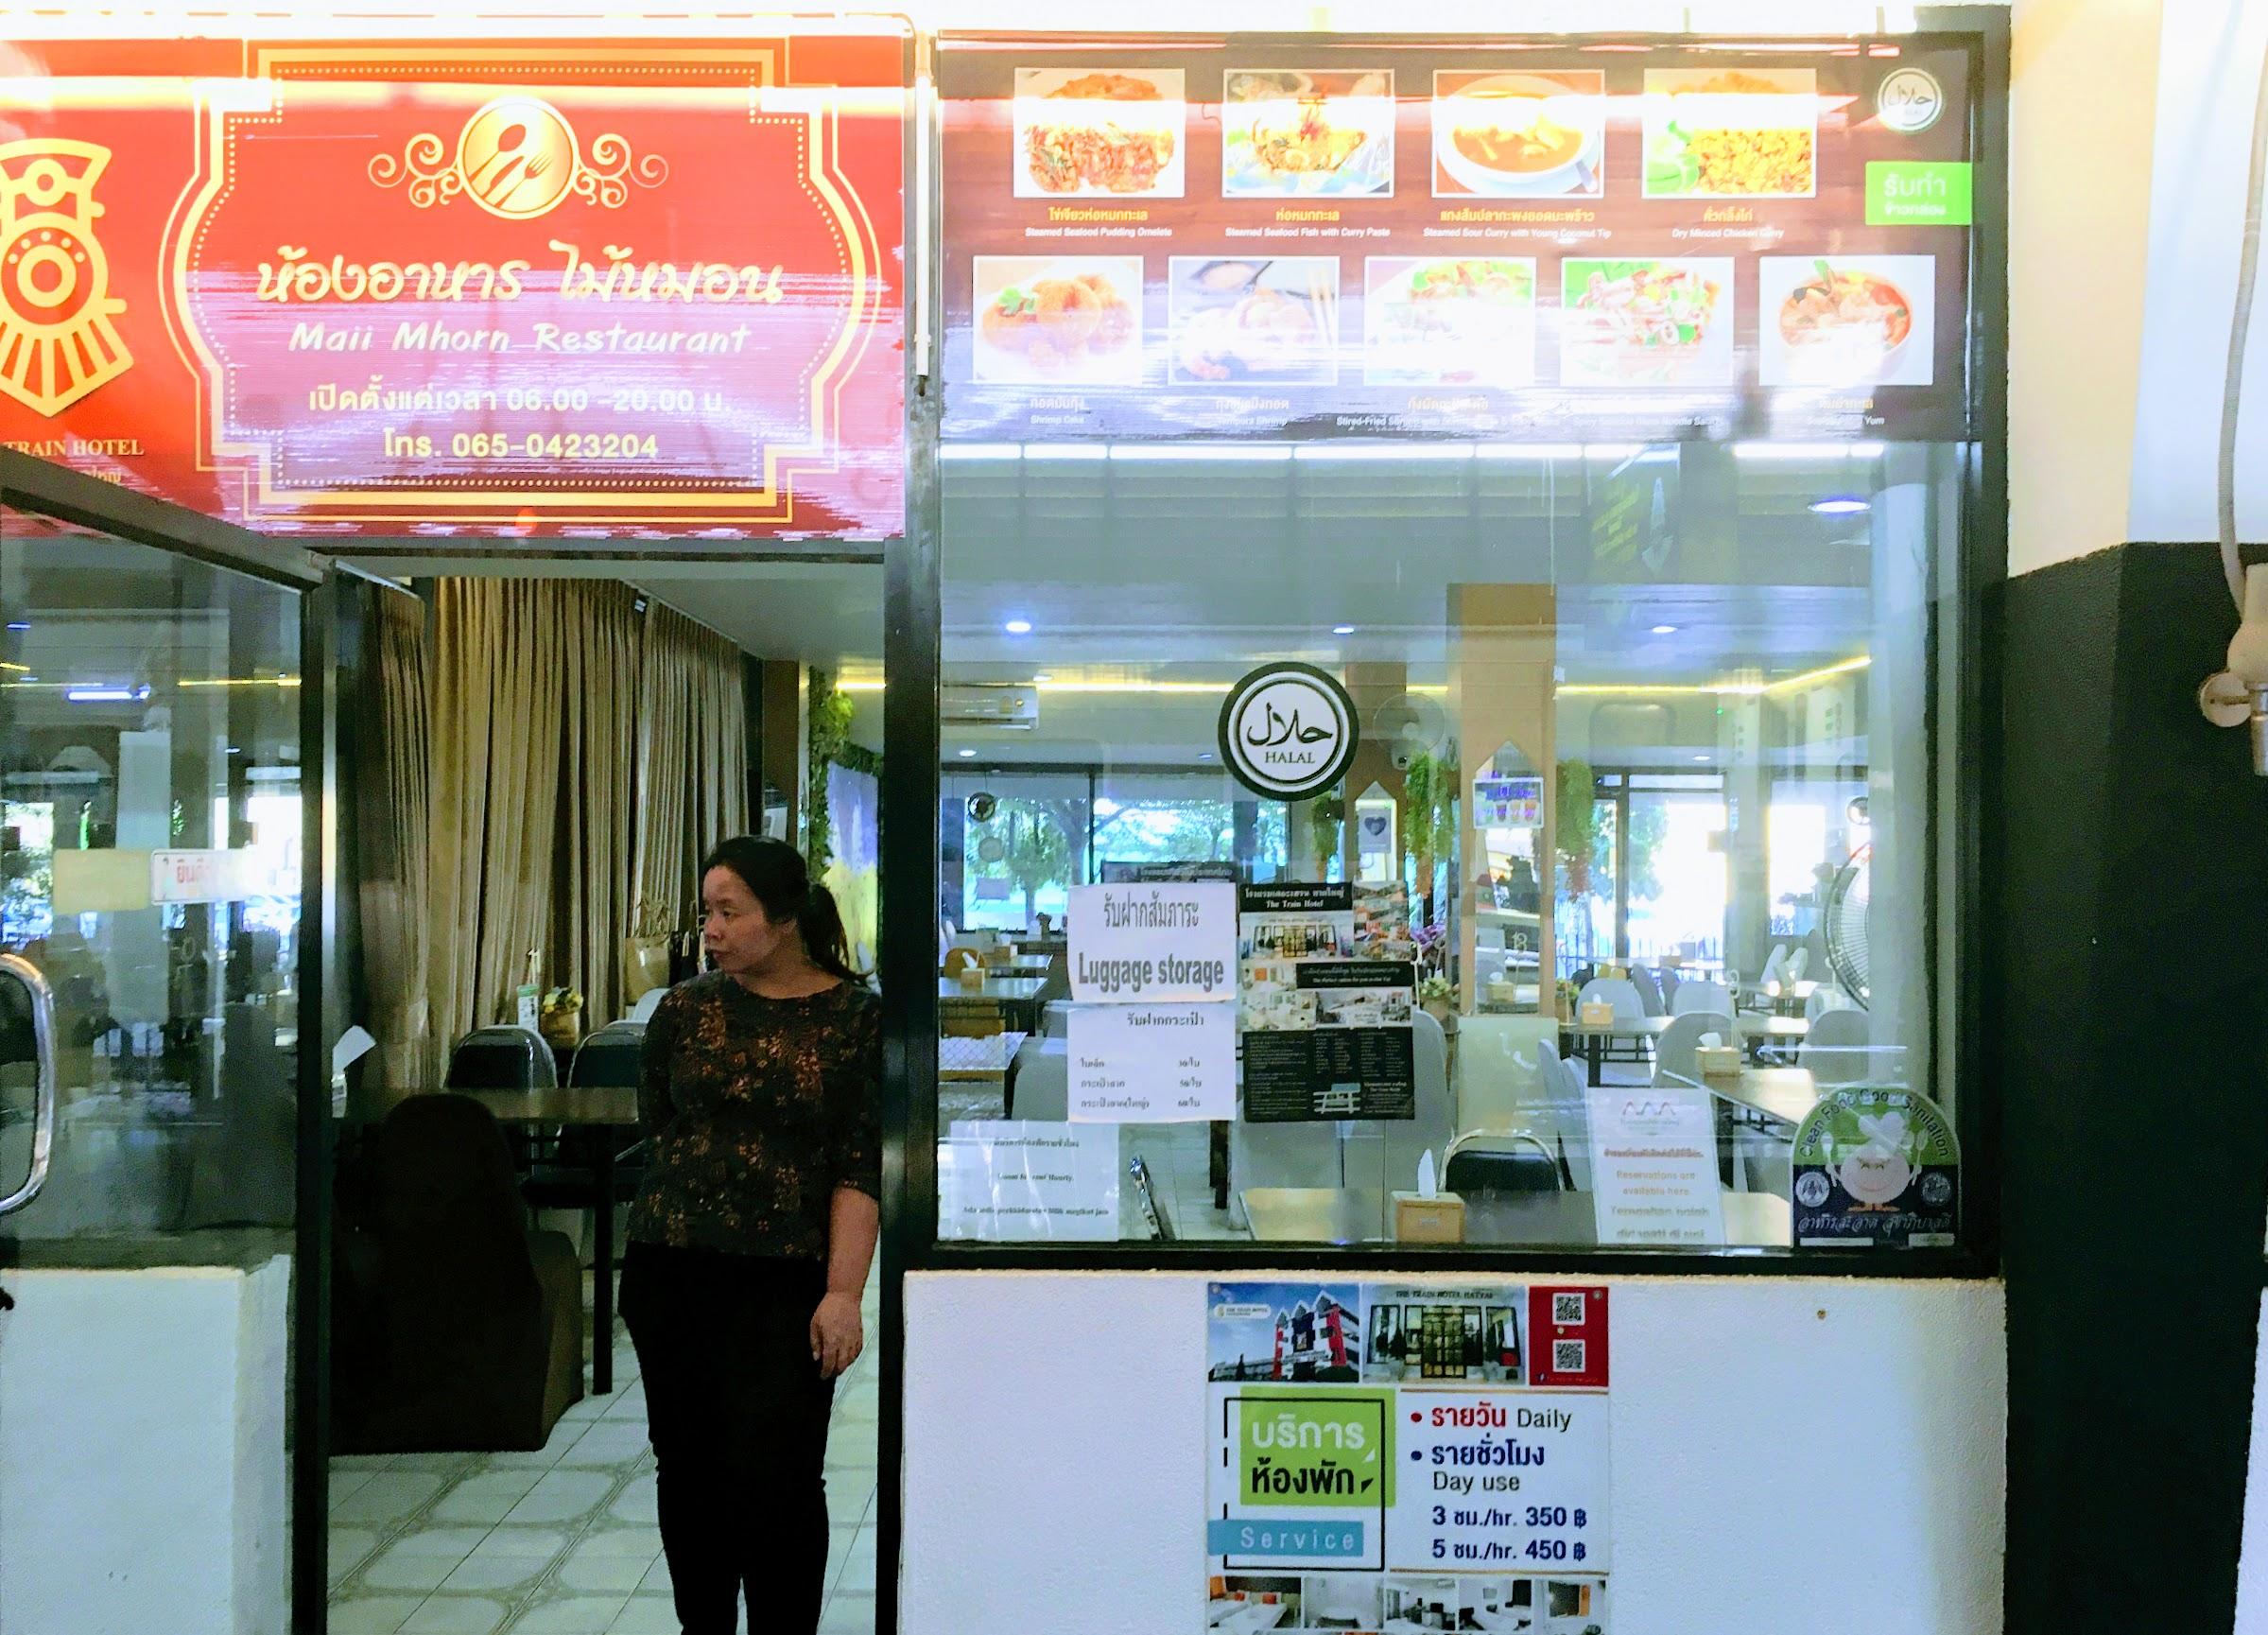 Maii Mhorn restaurant